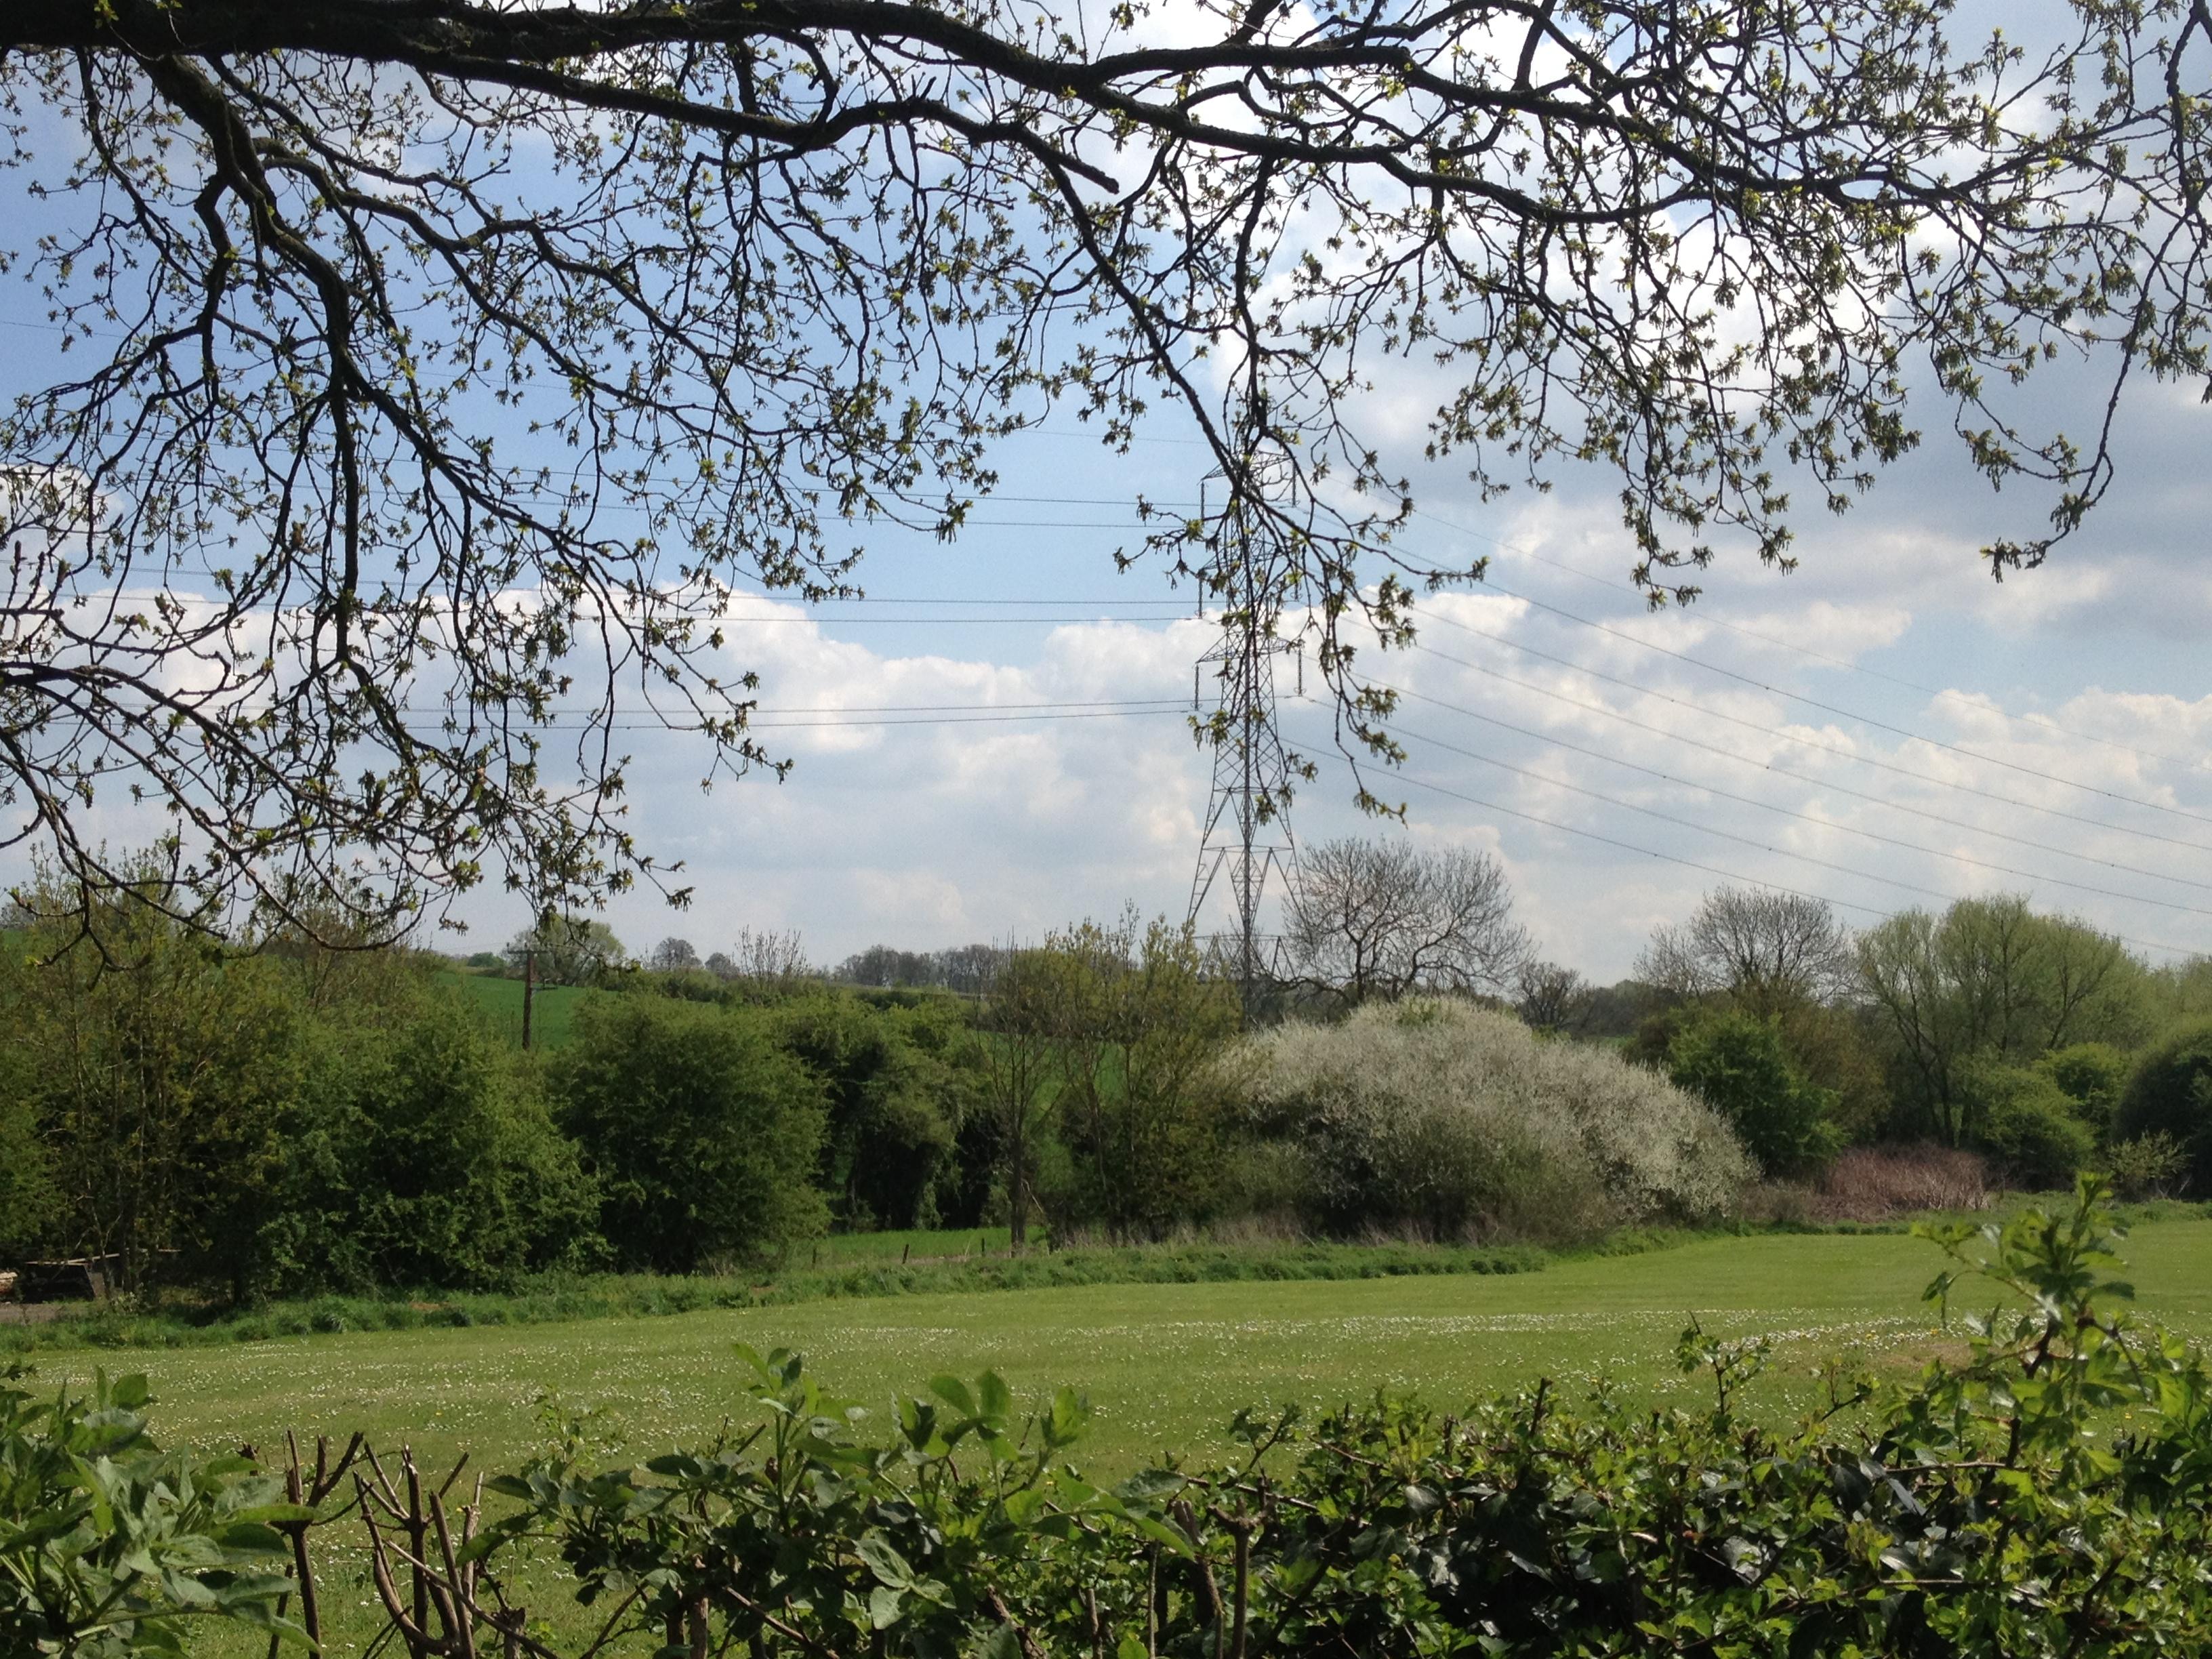 Le reste de l 39 angleterre balade dans le hertfordshire for Campagne anglaise